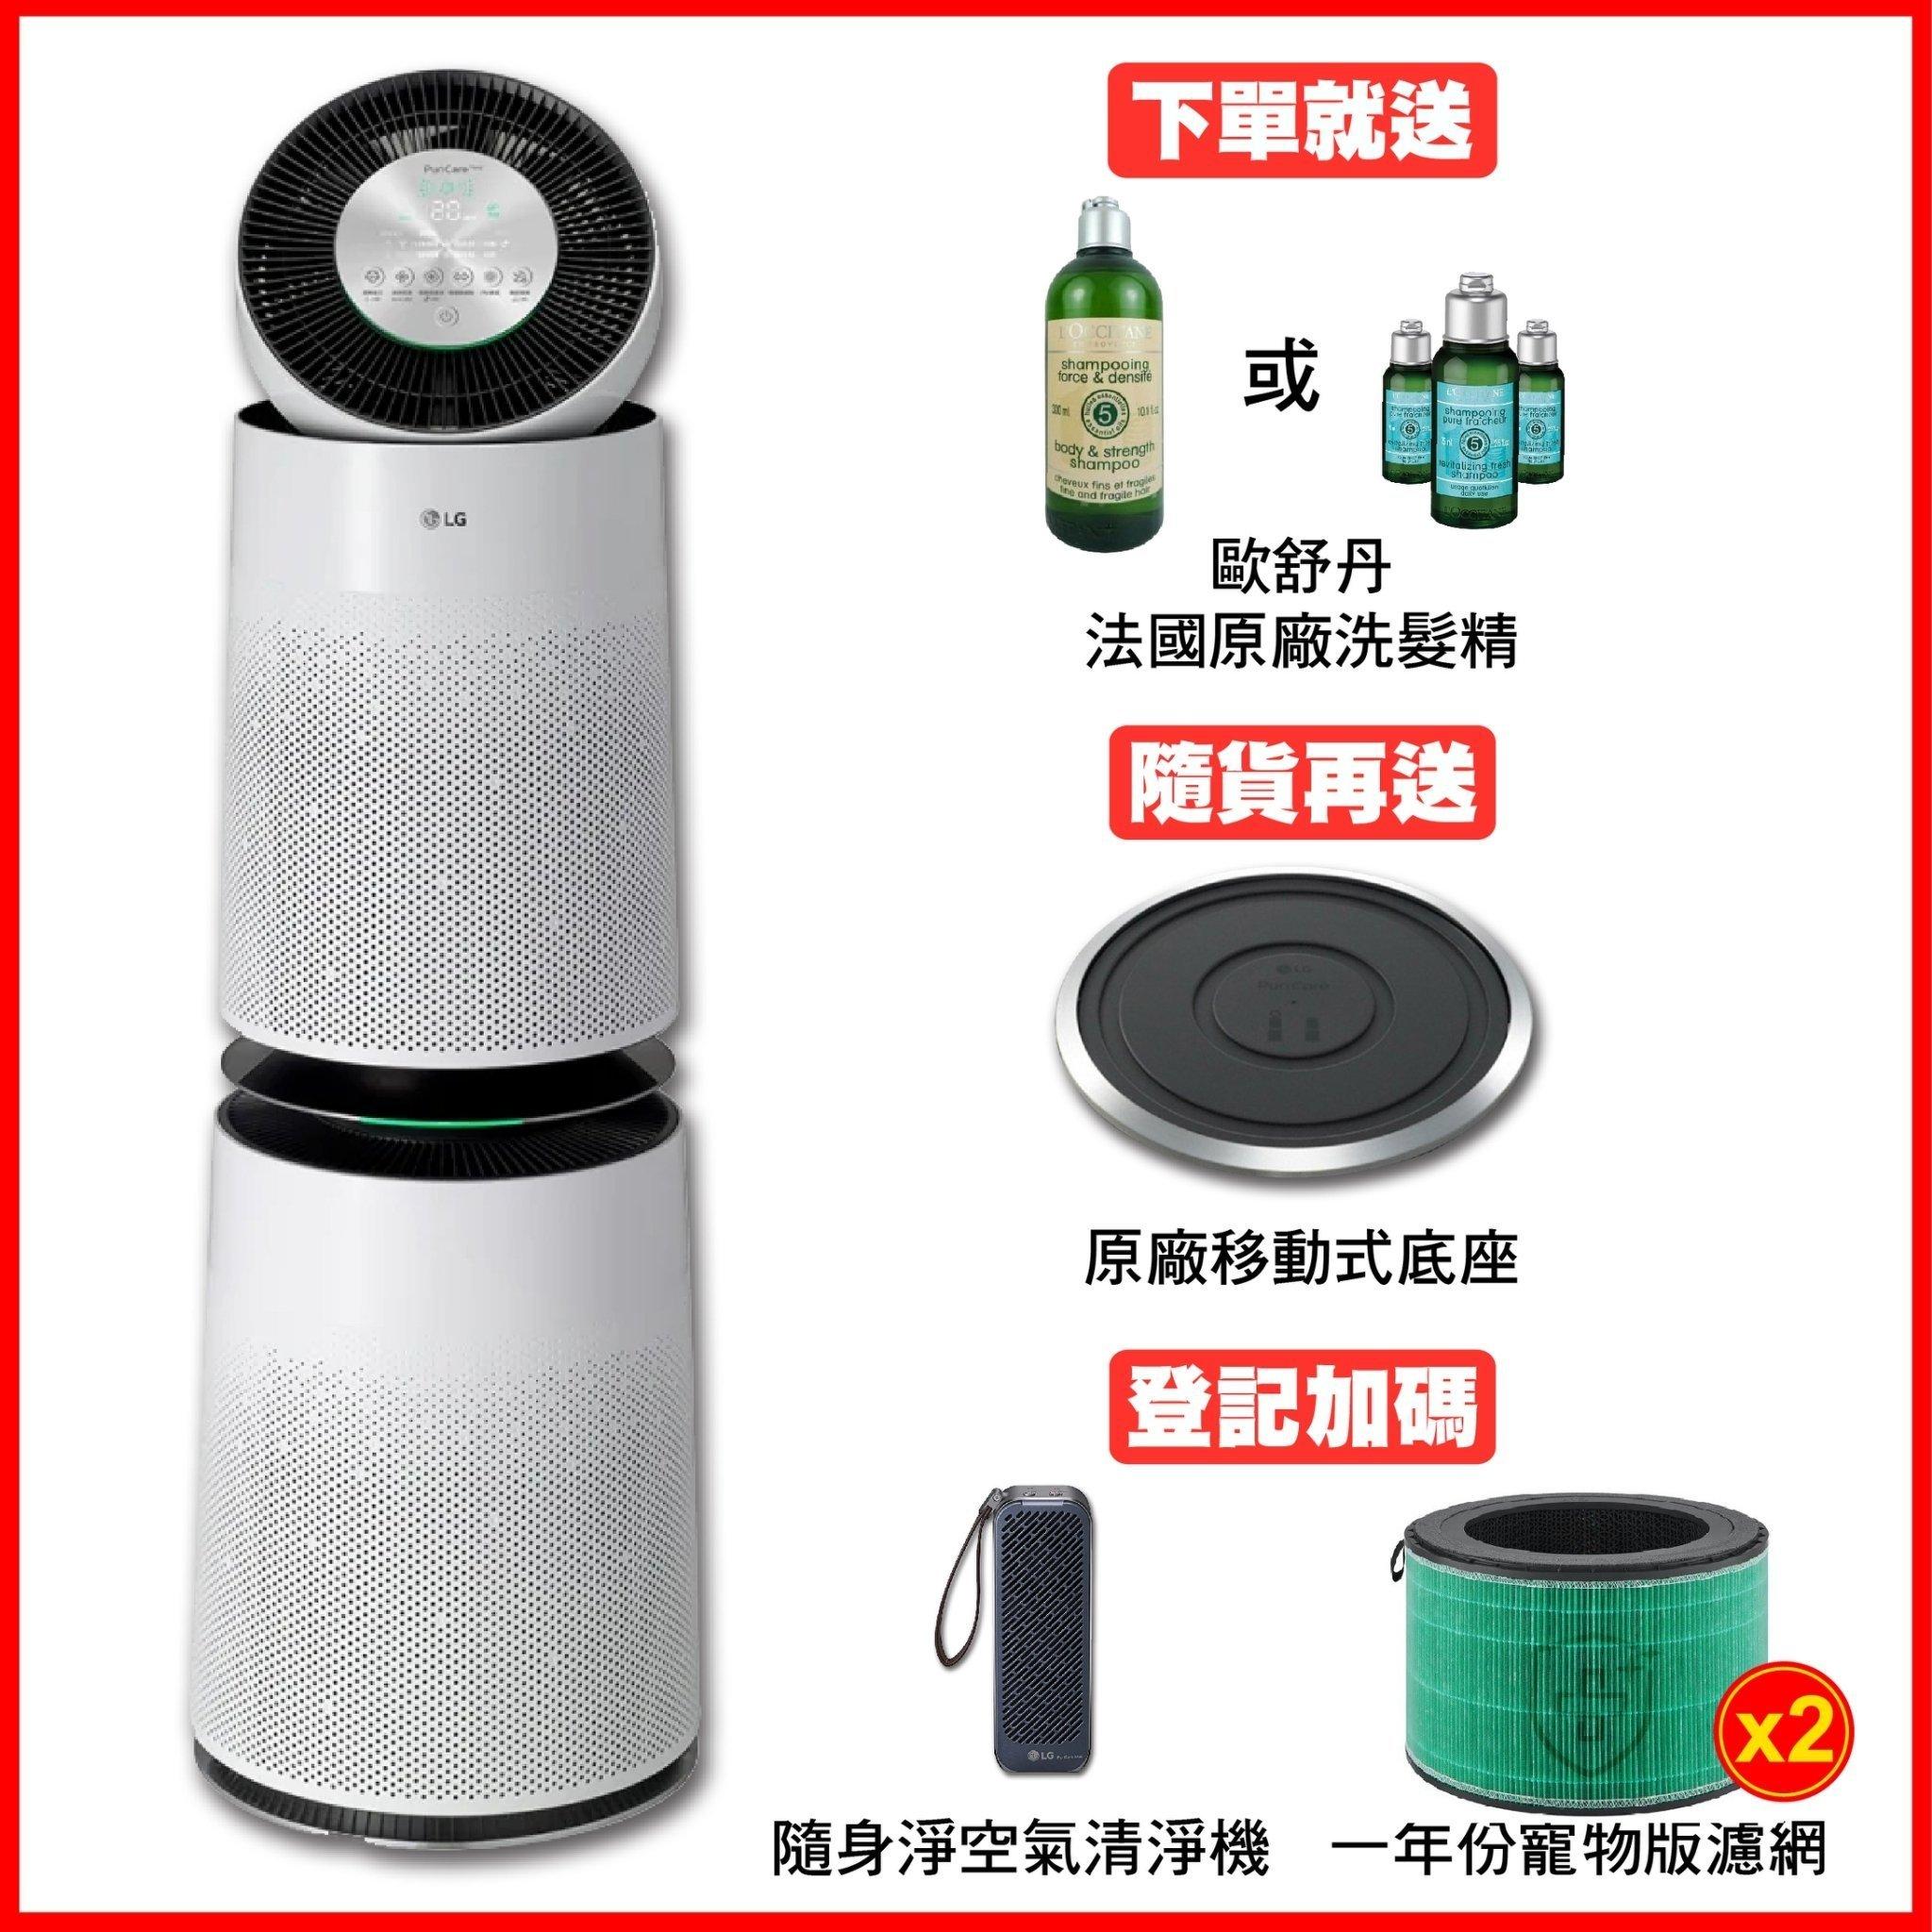 LG 樂金 PuriCare™360°空氣清淨機 2.0 AS101DWH0 原廠保固 夜間促銷超低價 黑皮TIME